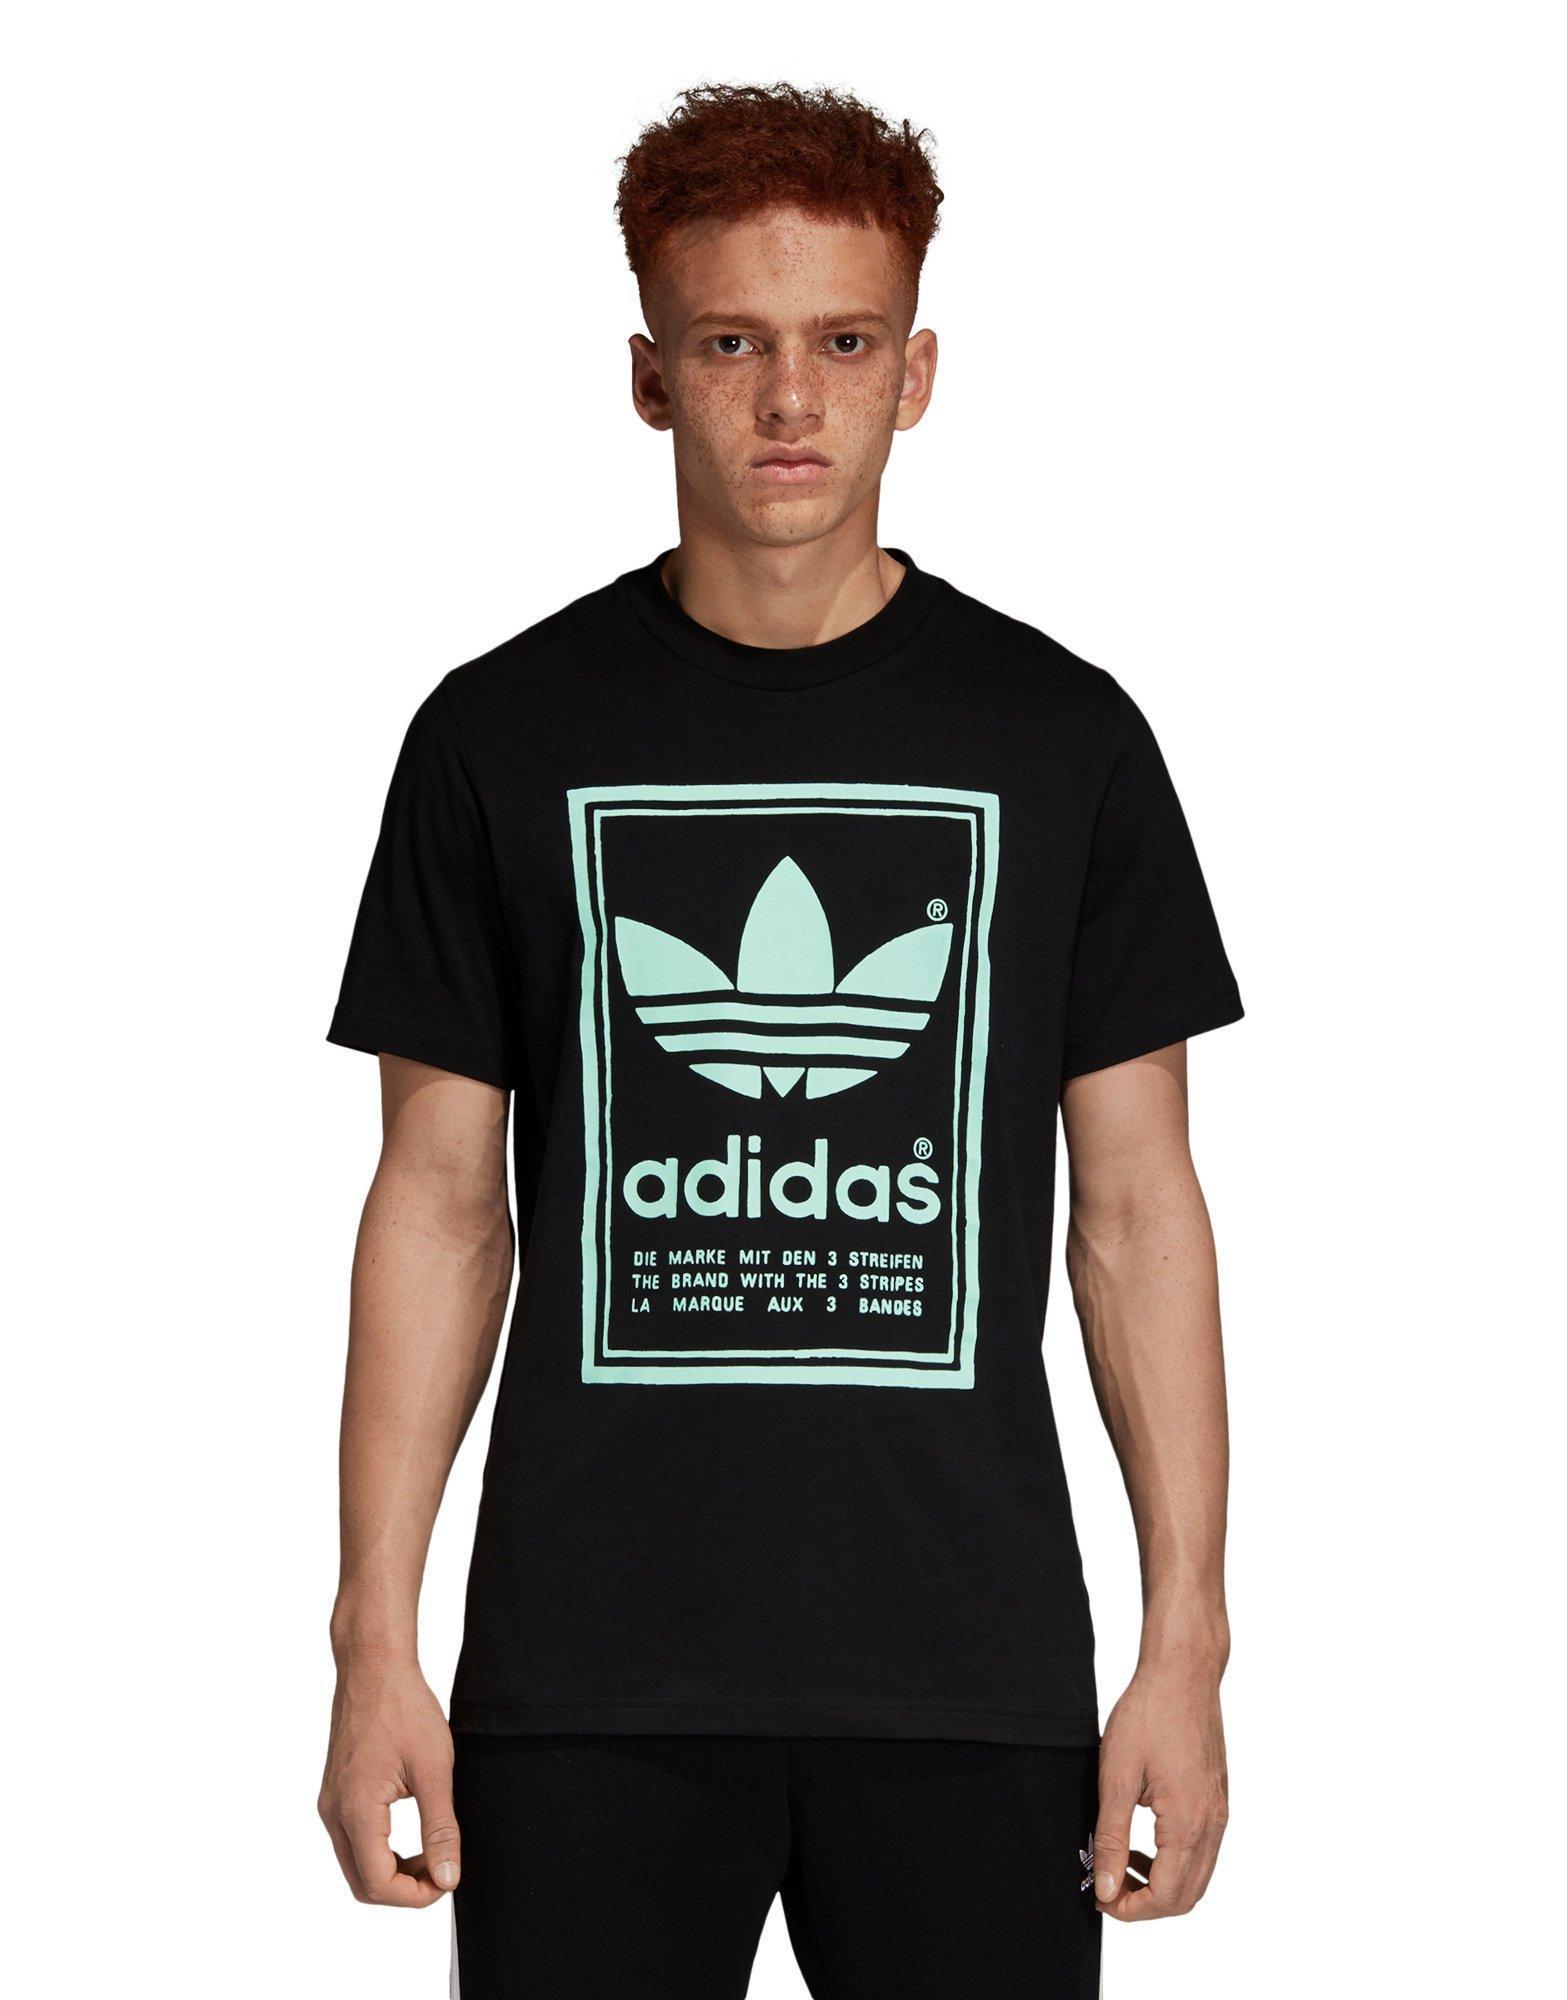 Cesta riesgo Residuos  Adidas Originals Men's VINTAGE T-Shirt Black/Neon DJ2712 c T-Shirts